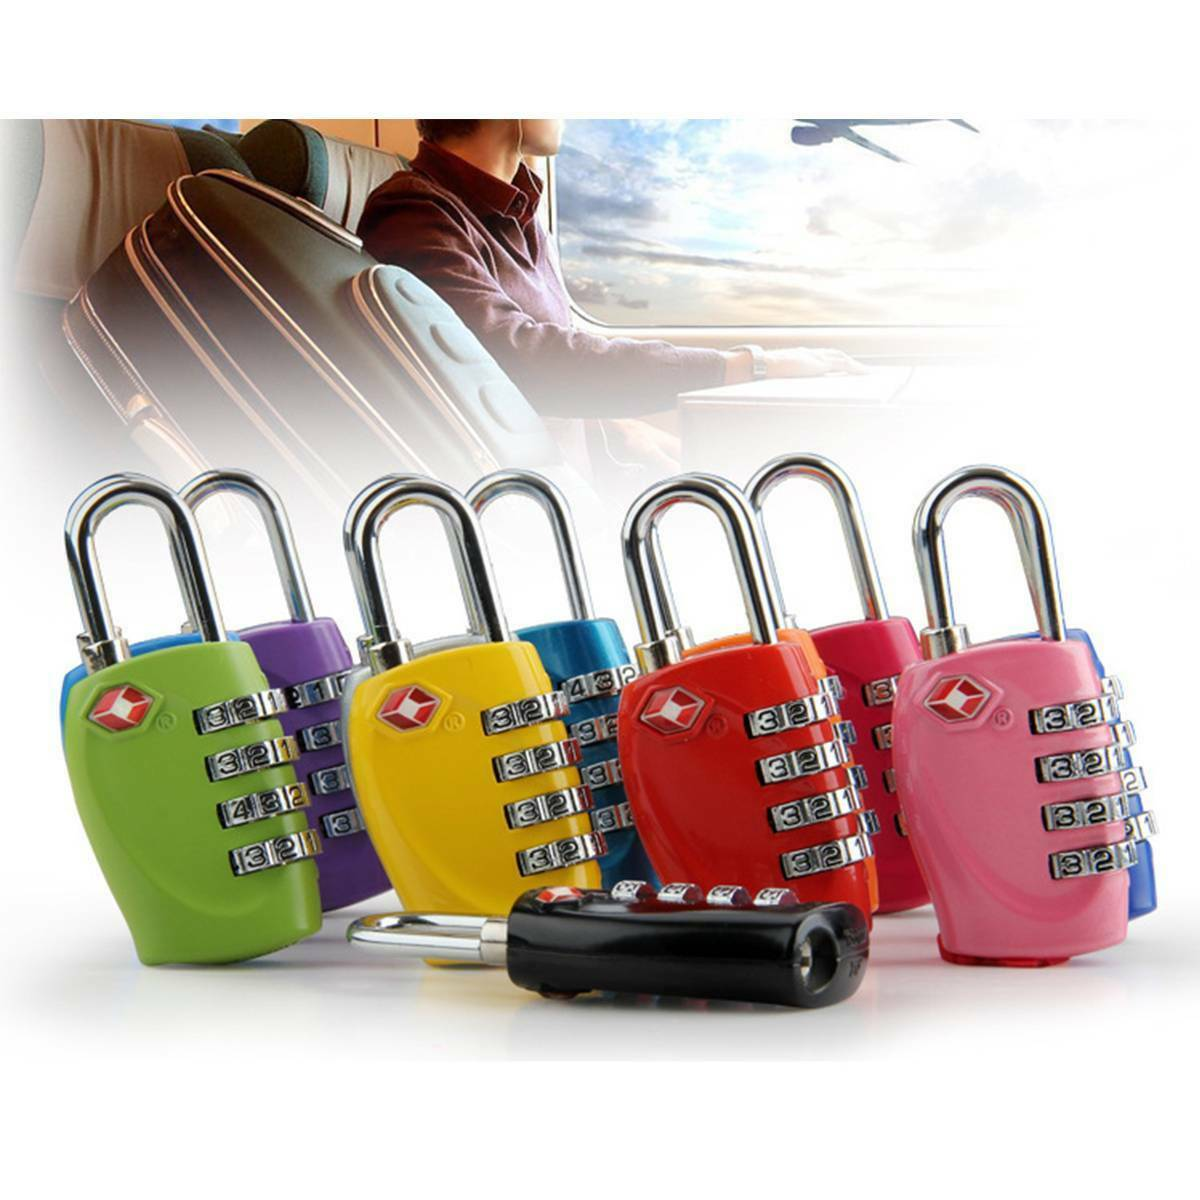 4-bit-dial password padlock travel suitcase portable padlock Random Color Chic